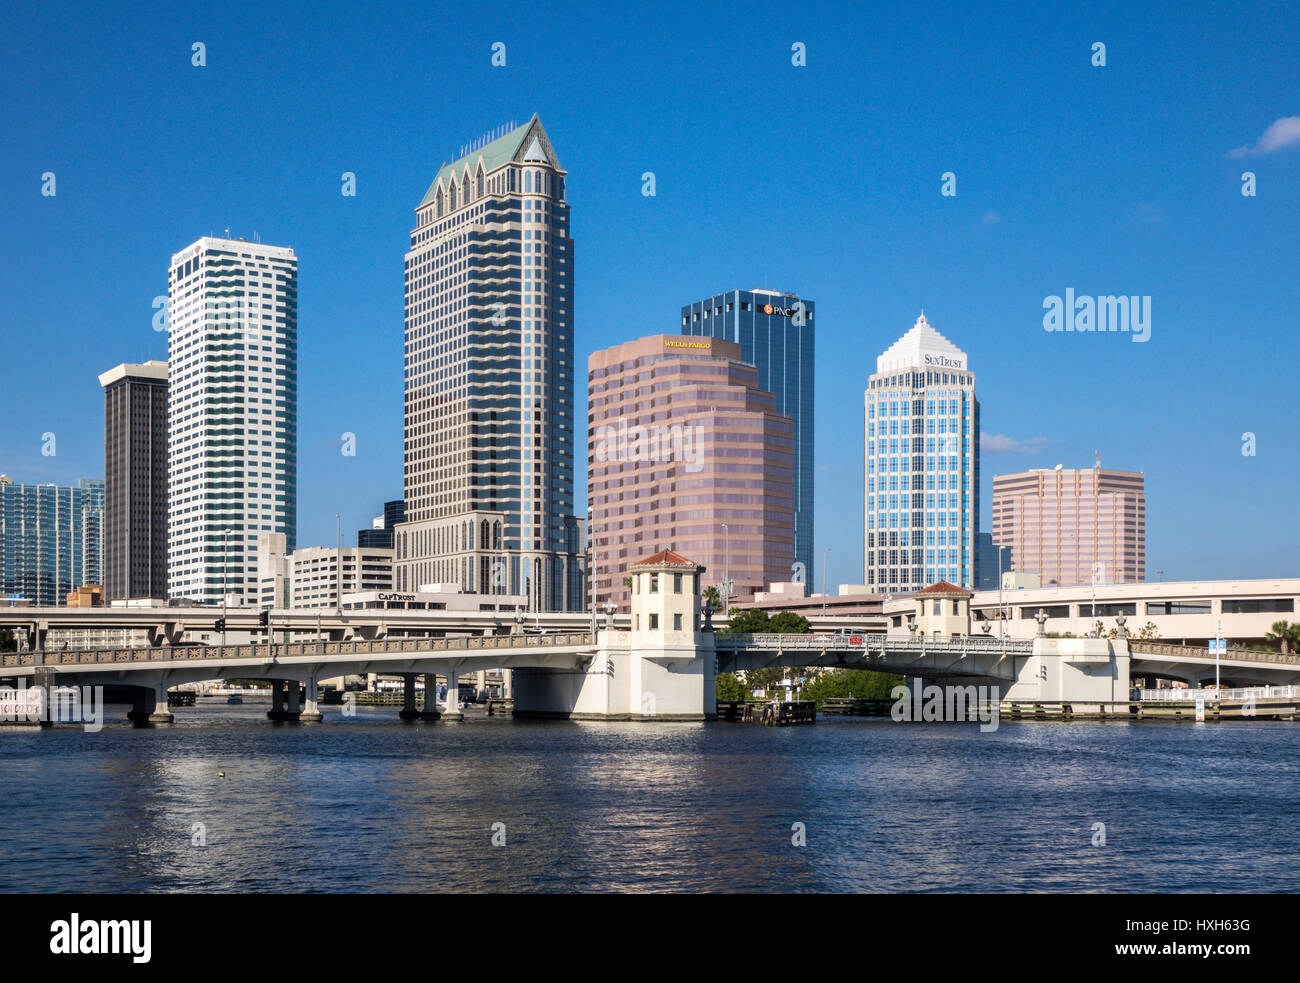 Tampa skyline CBD skyscrapers, Florida, USA Stock Photo